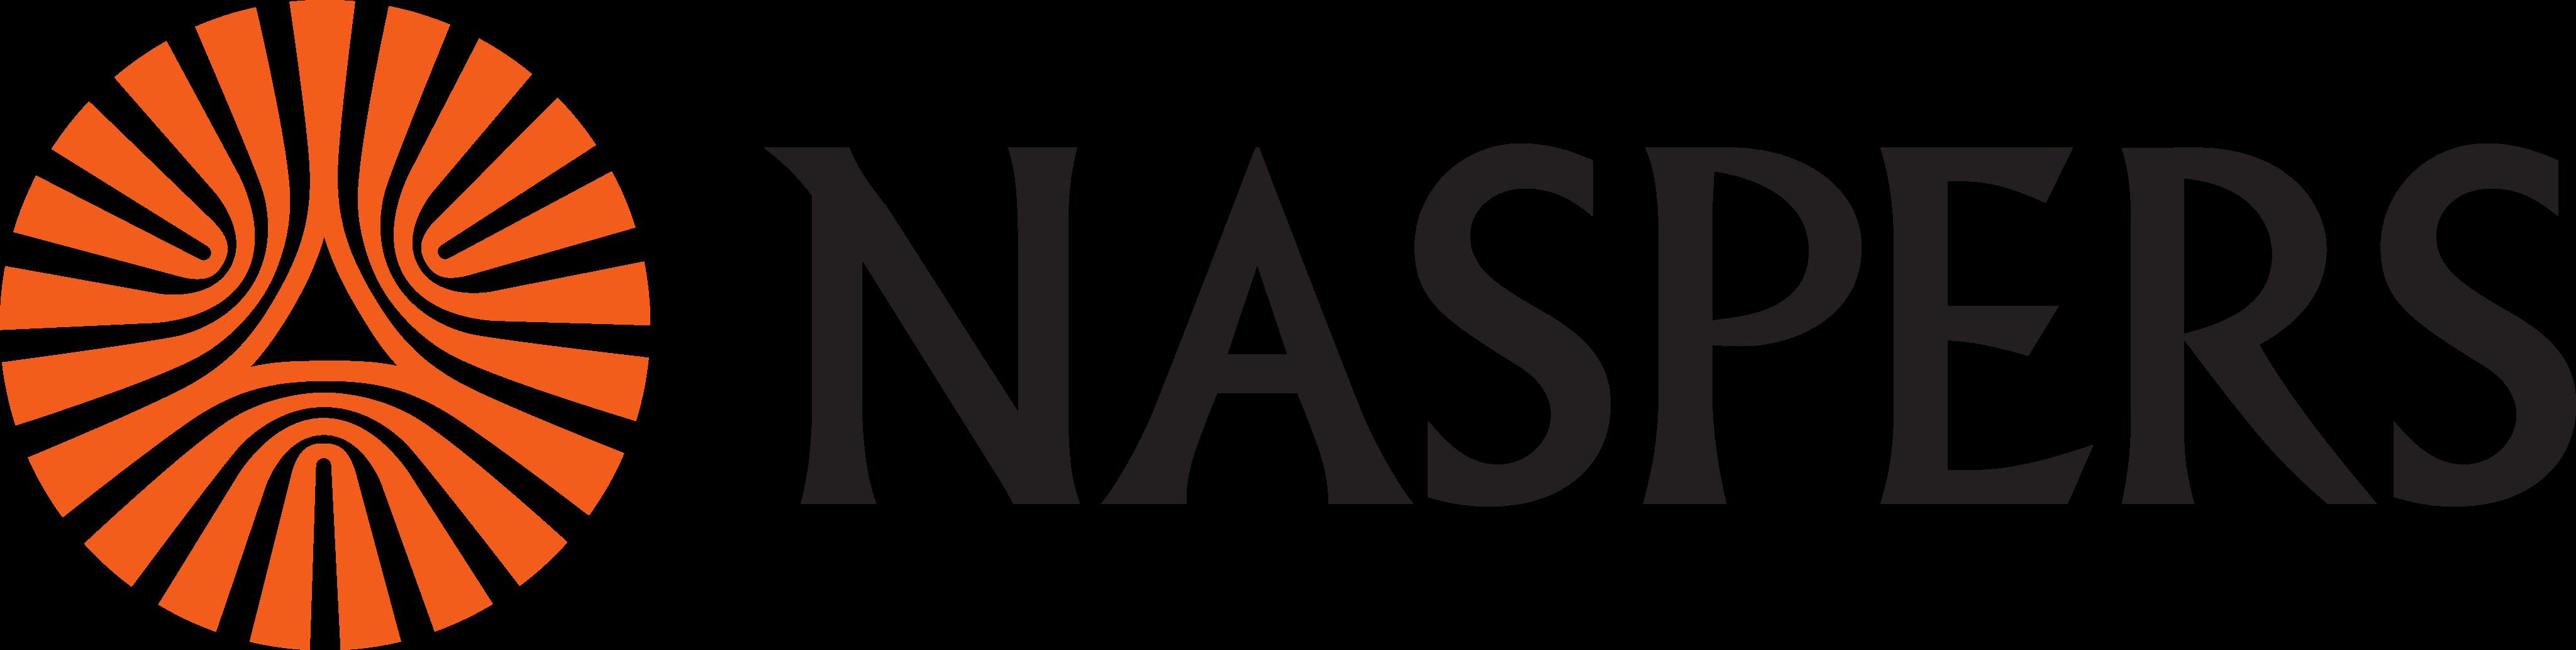 Naspers Logo.